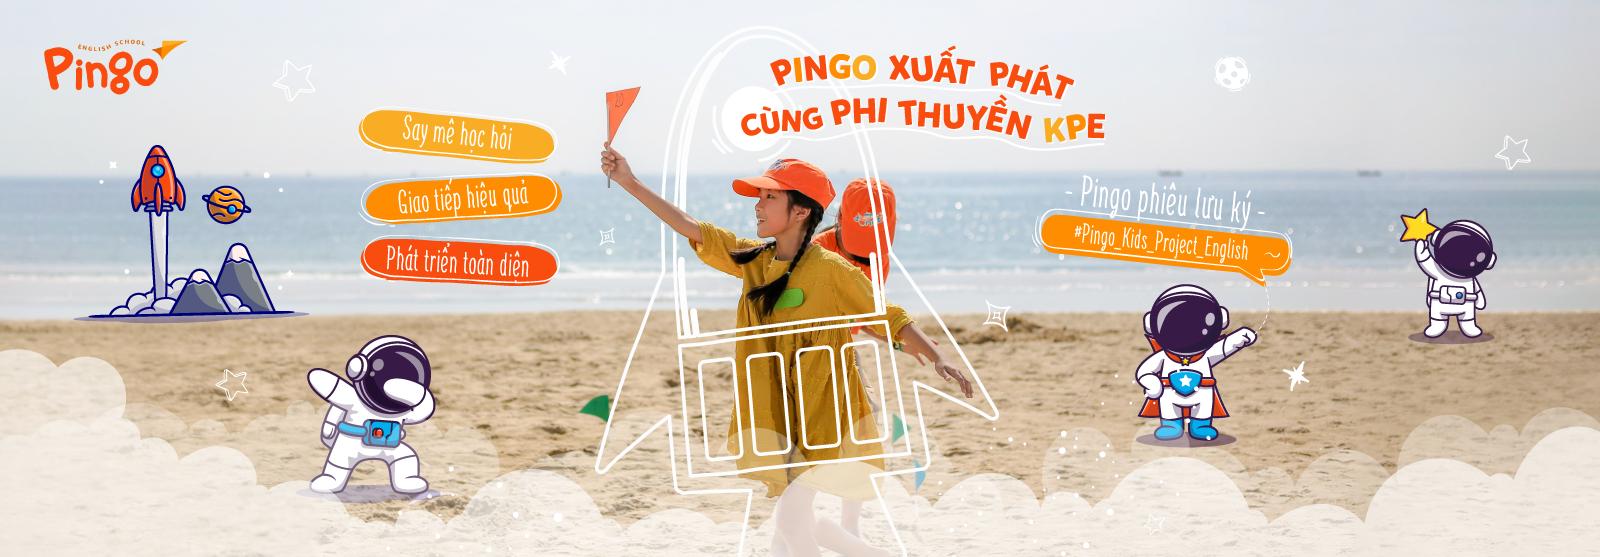 2021.08.02_PINGO_xuat_phat_cung_du_thuyen_KPE_banner_web